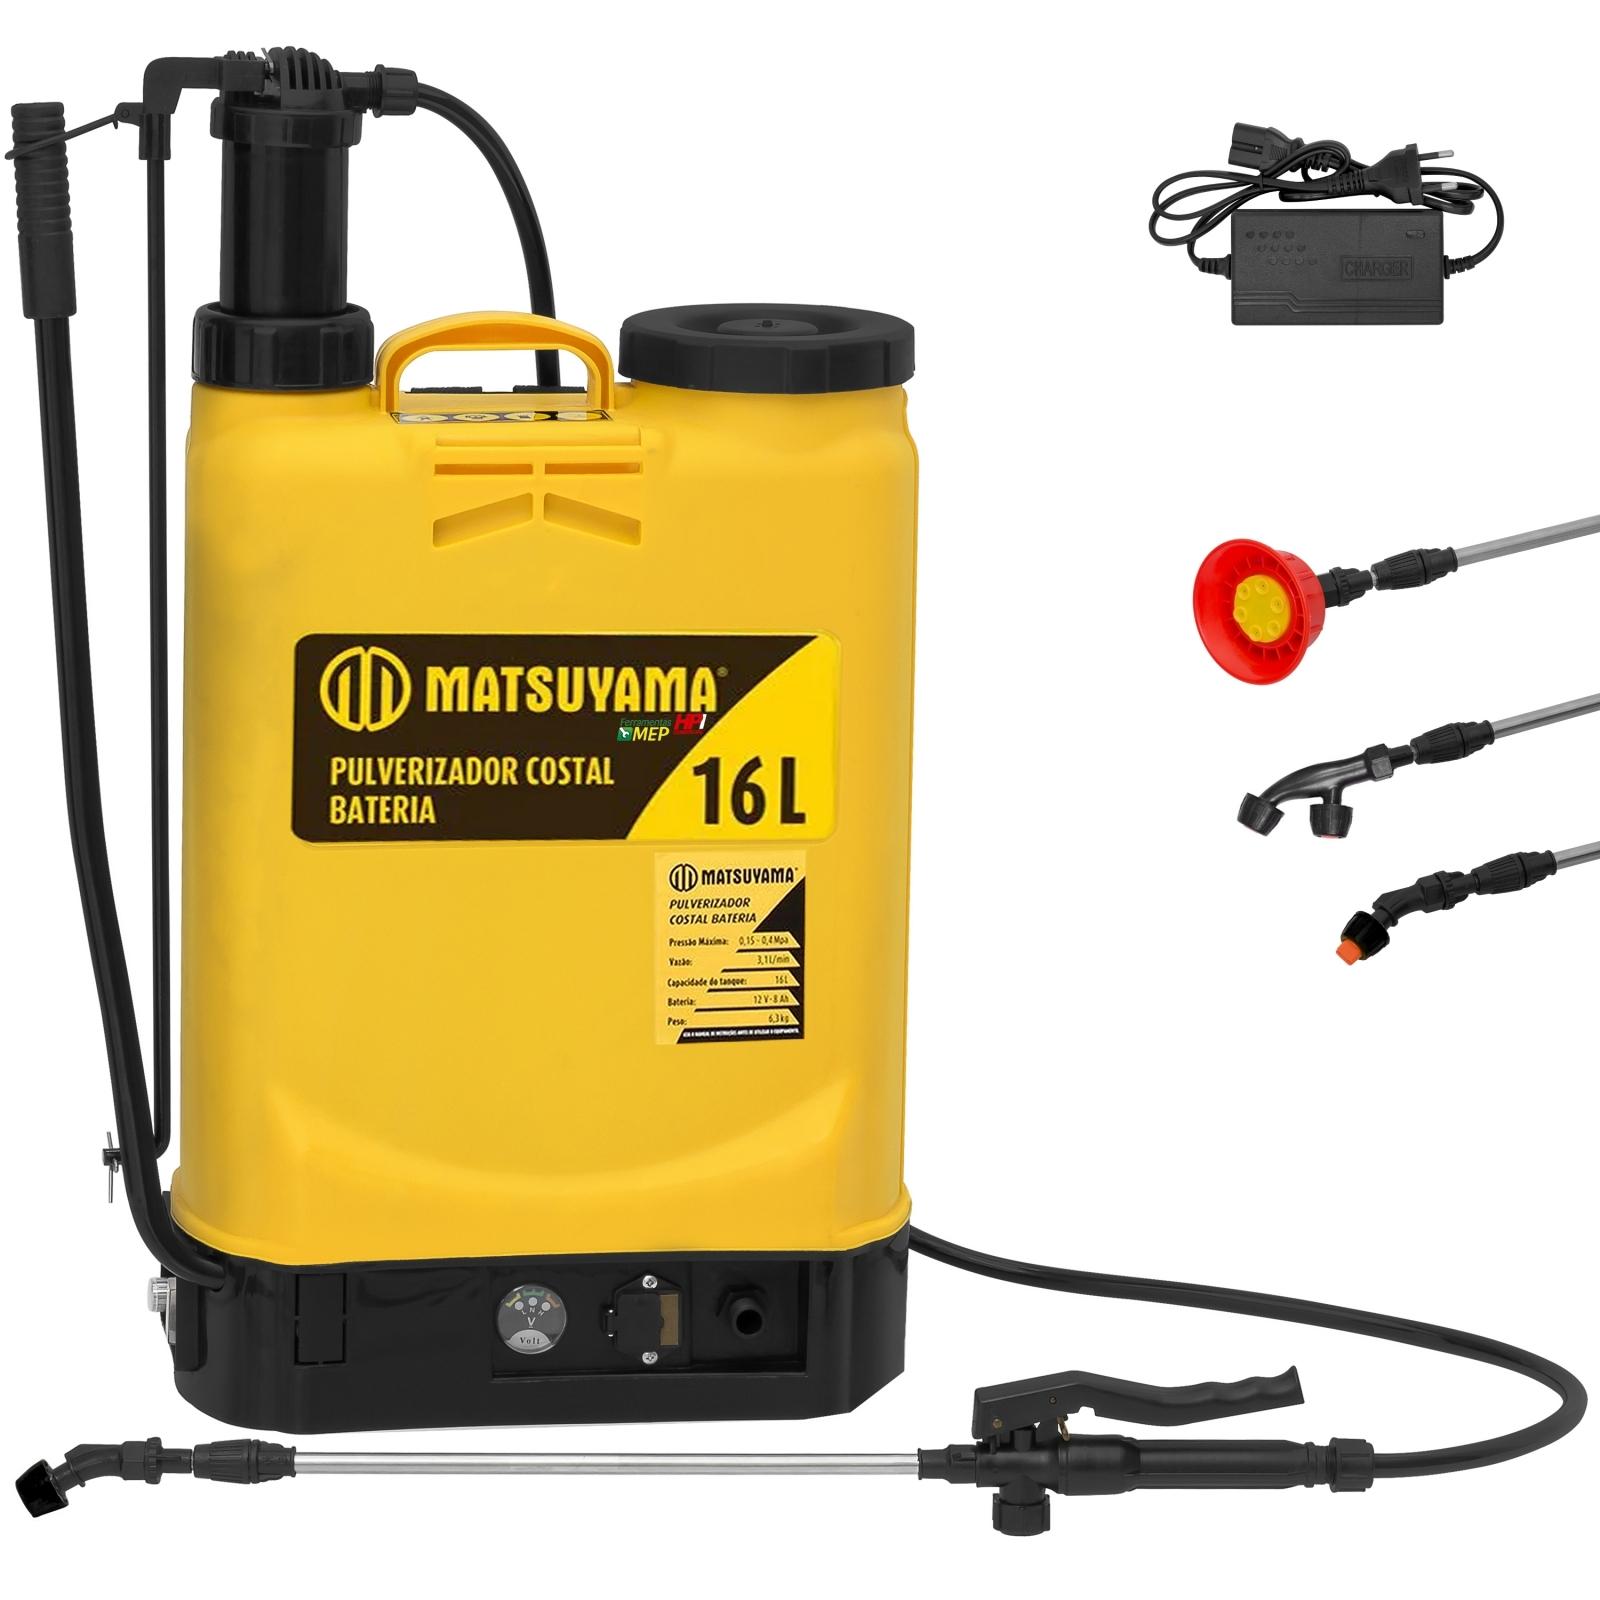 Pulverizador Costal 16 Litros Matsuyama Bateria e Manual Pt1 - Ferramentas MEP